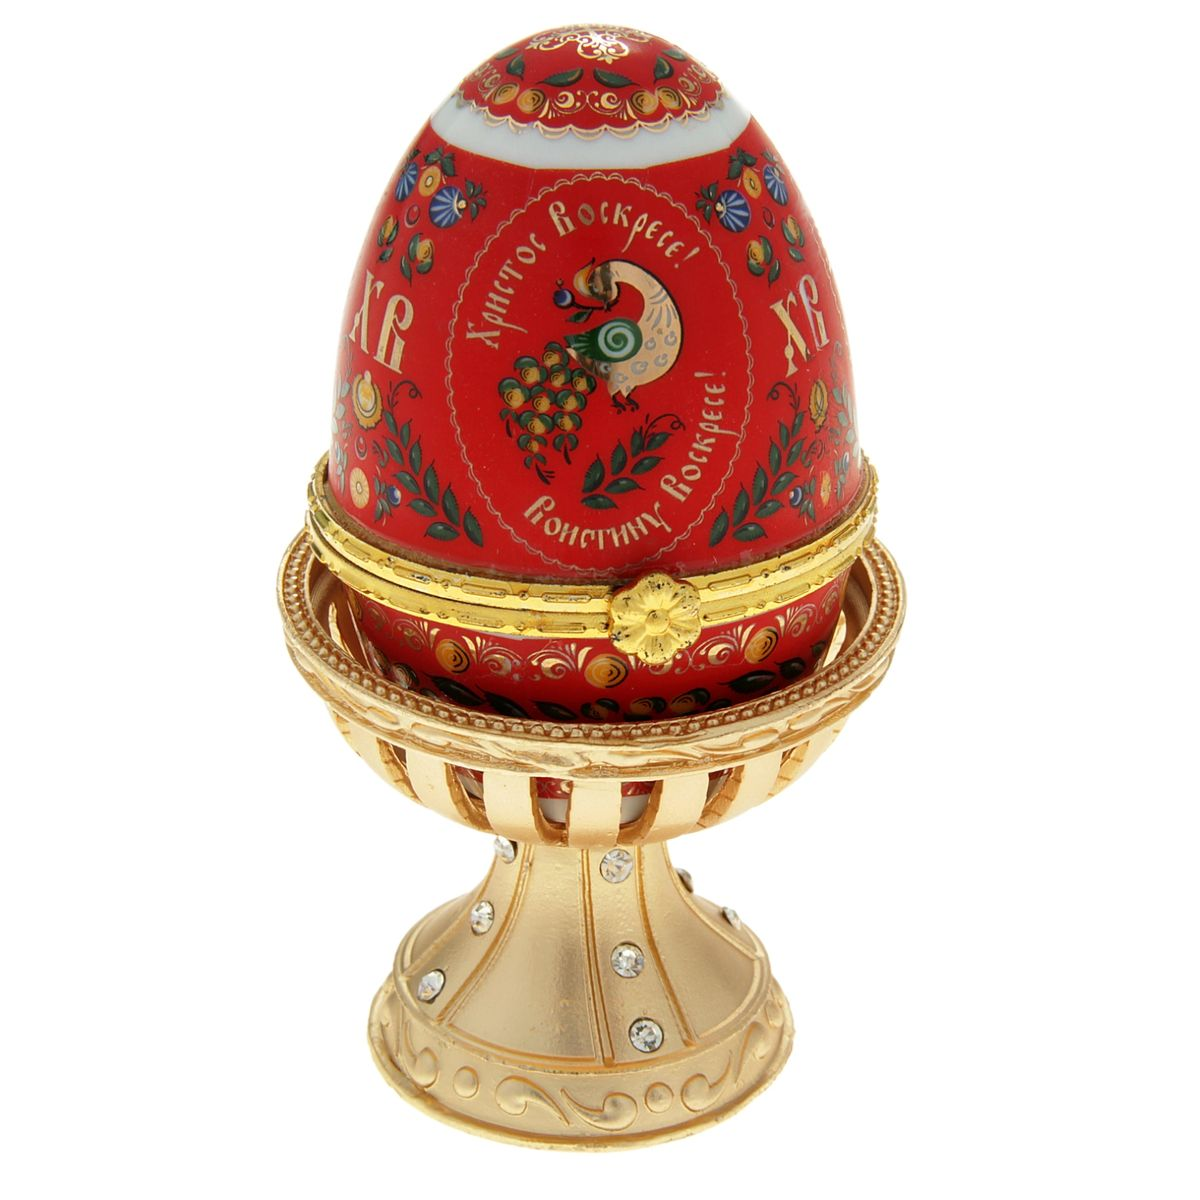 Яйцо-шкатулка Sima-land Хохлома, на подставке, высота 11 см яйцо декоративное sima land семистрельная на подставке высота 14 5 см